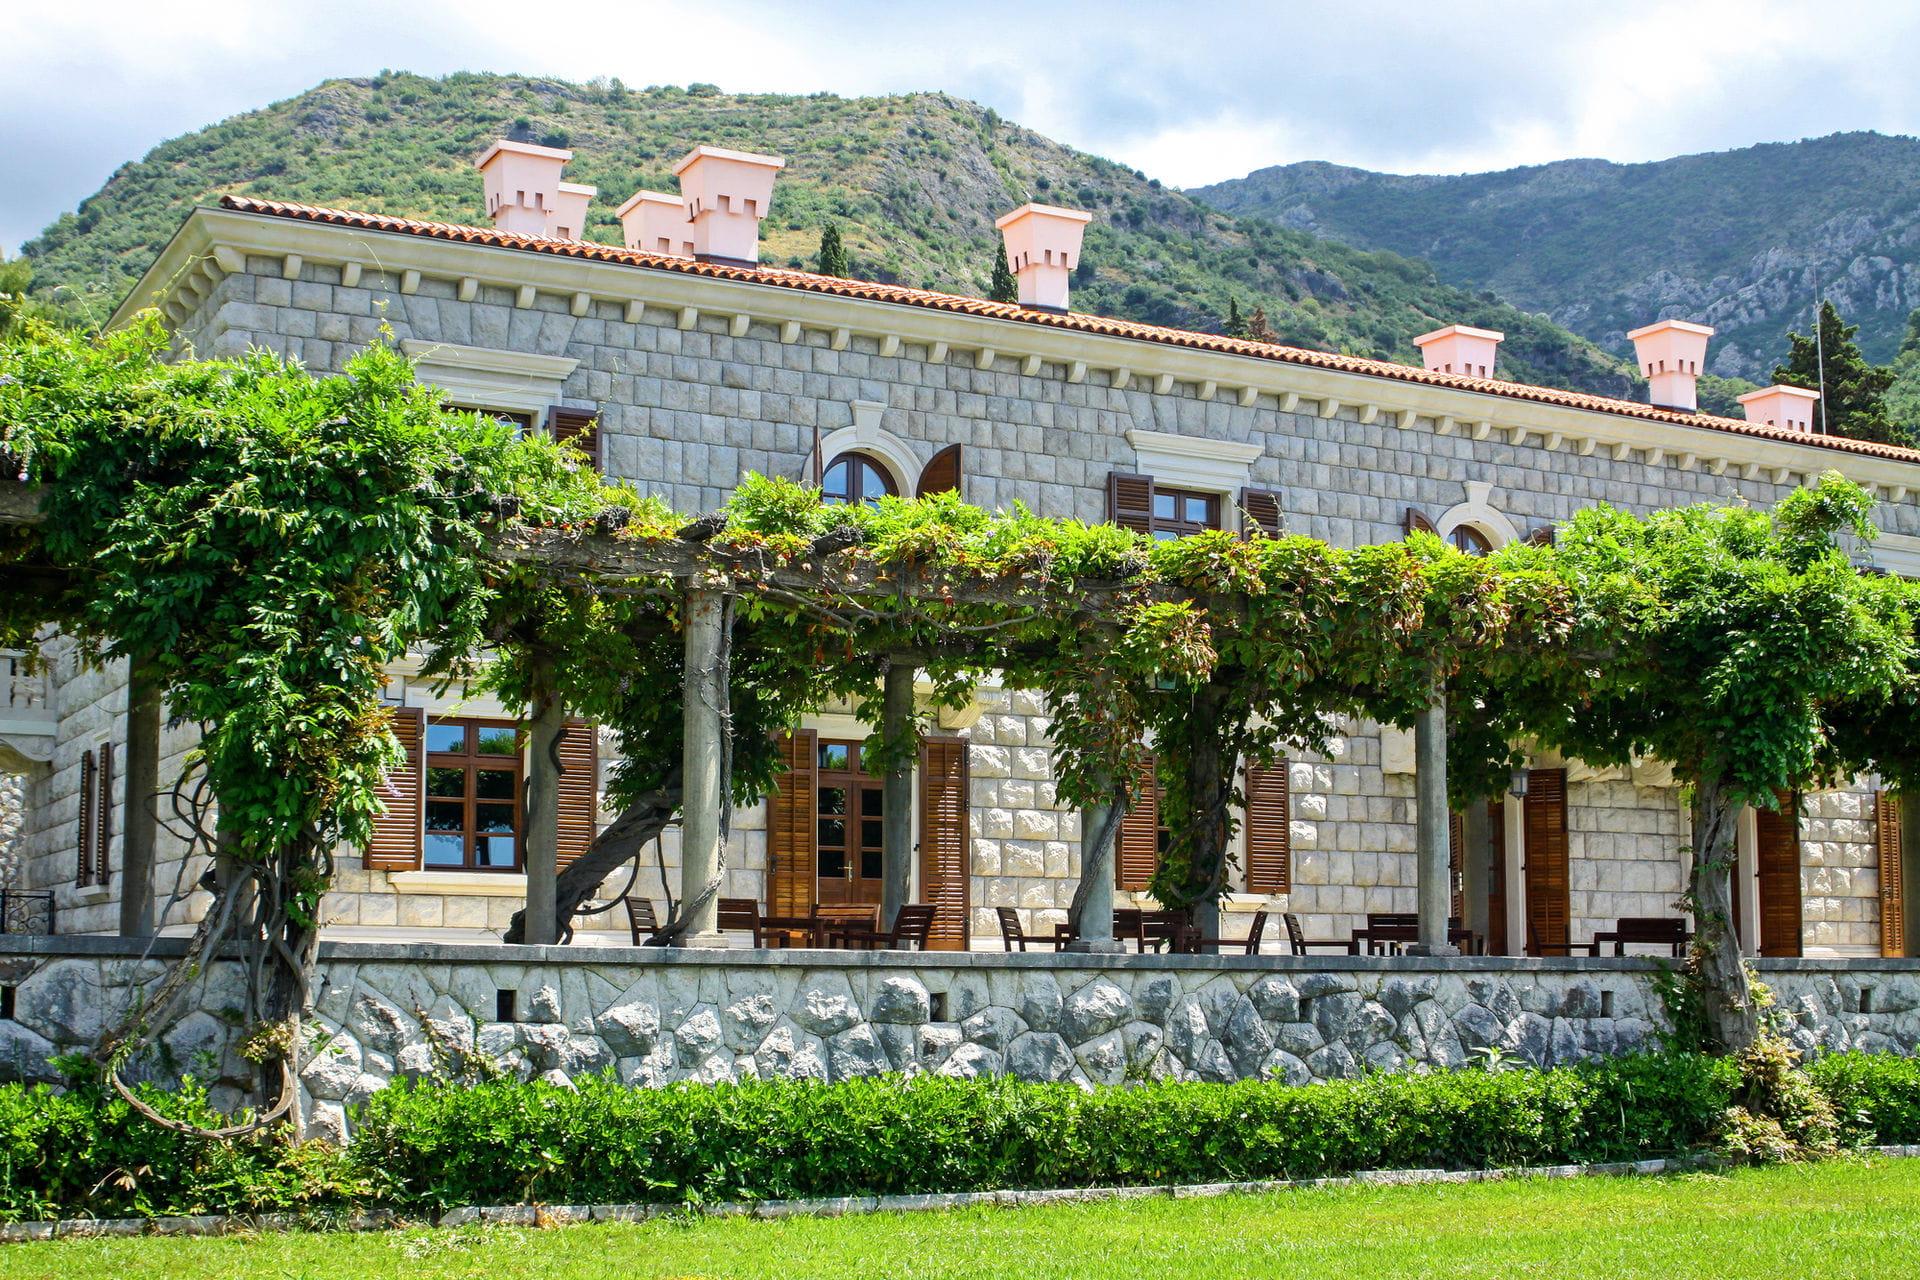 High quality hoto of Milocer Park - Montenegro